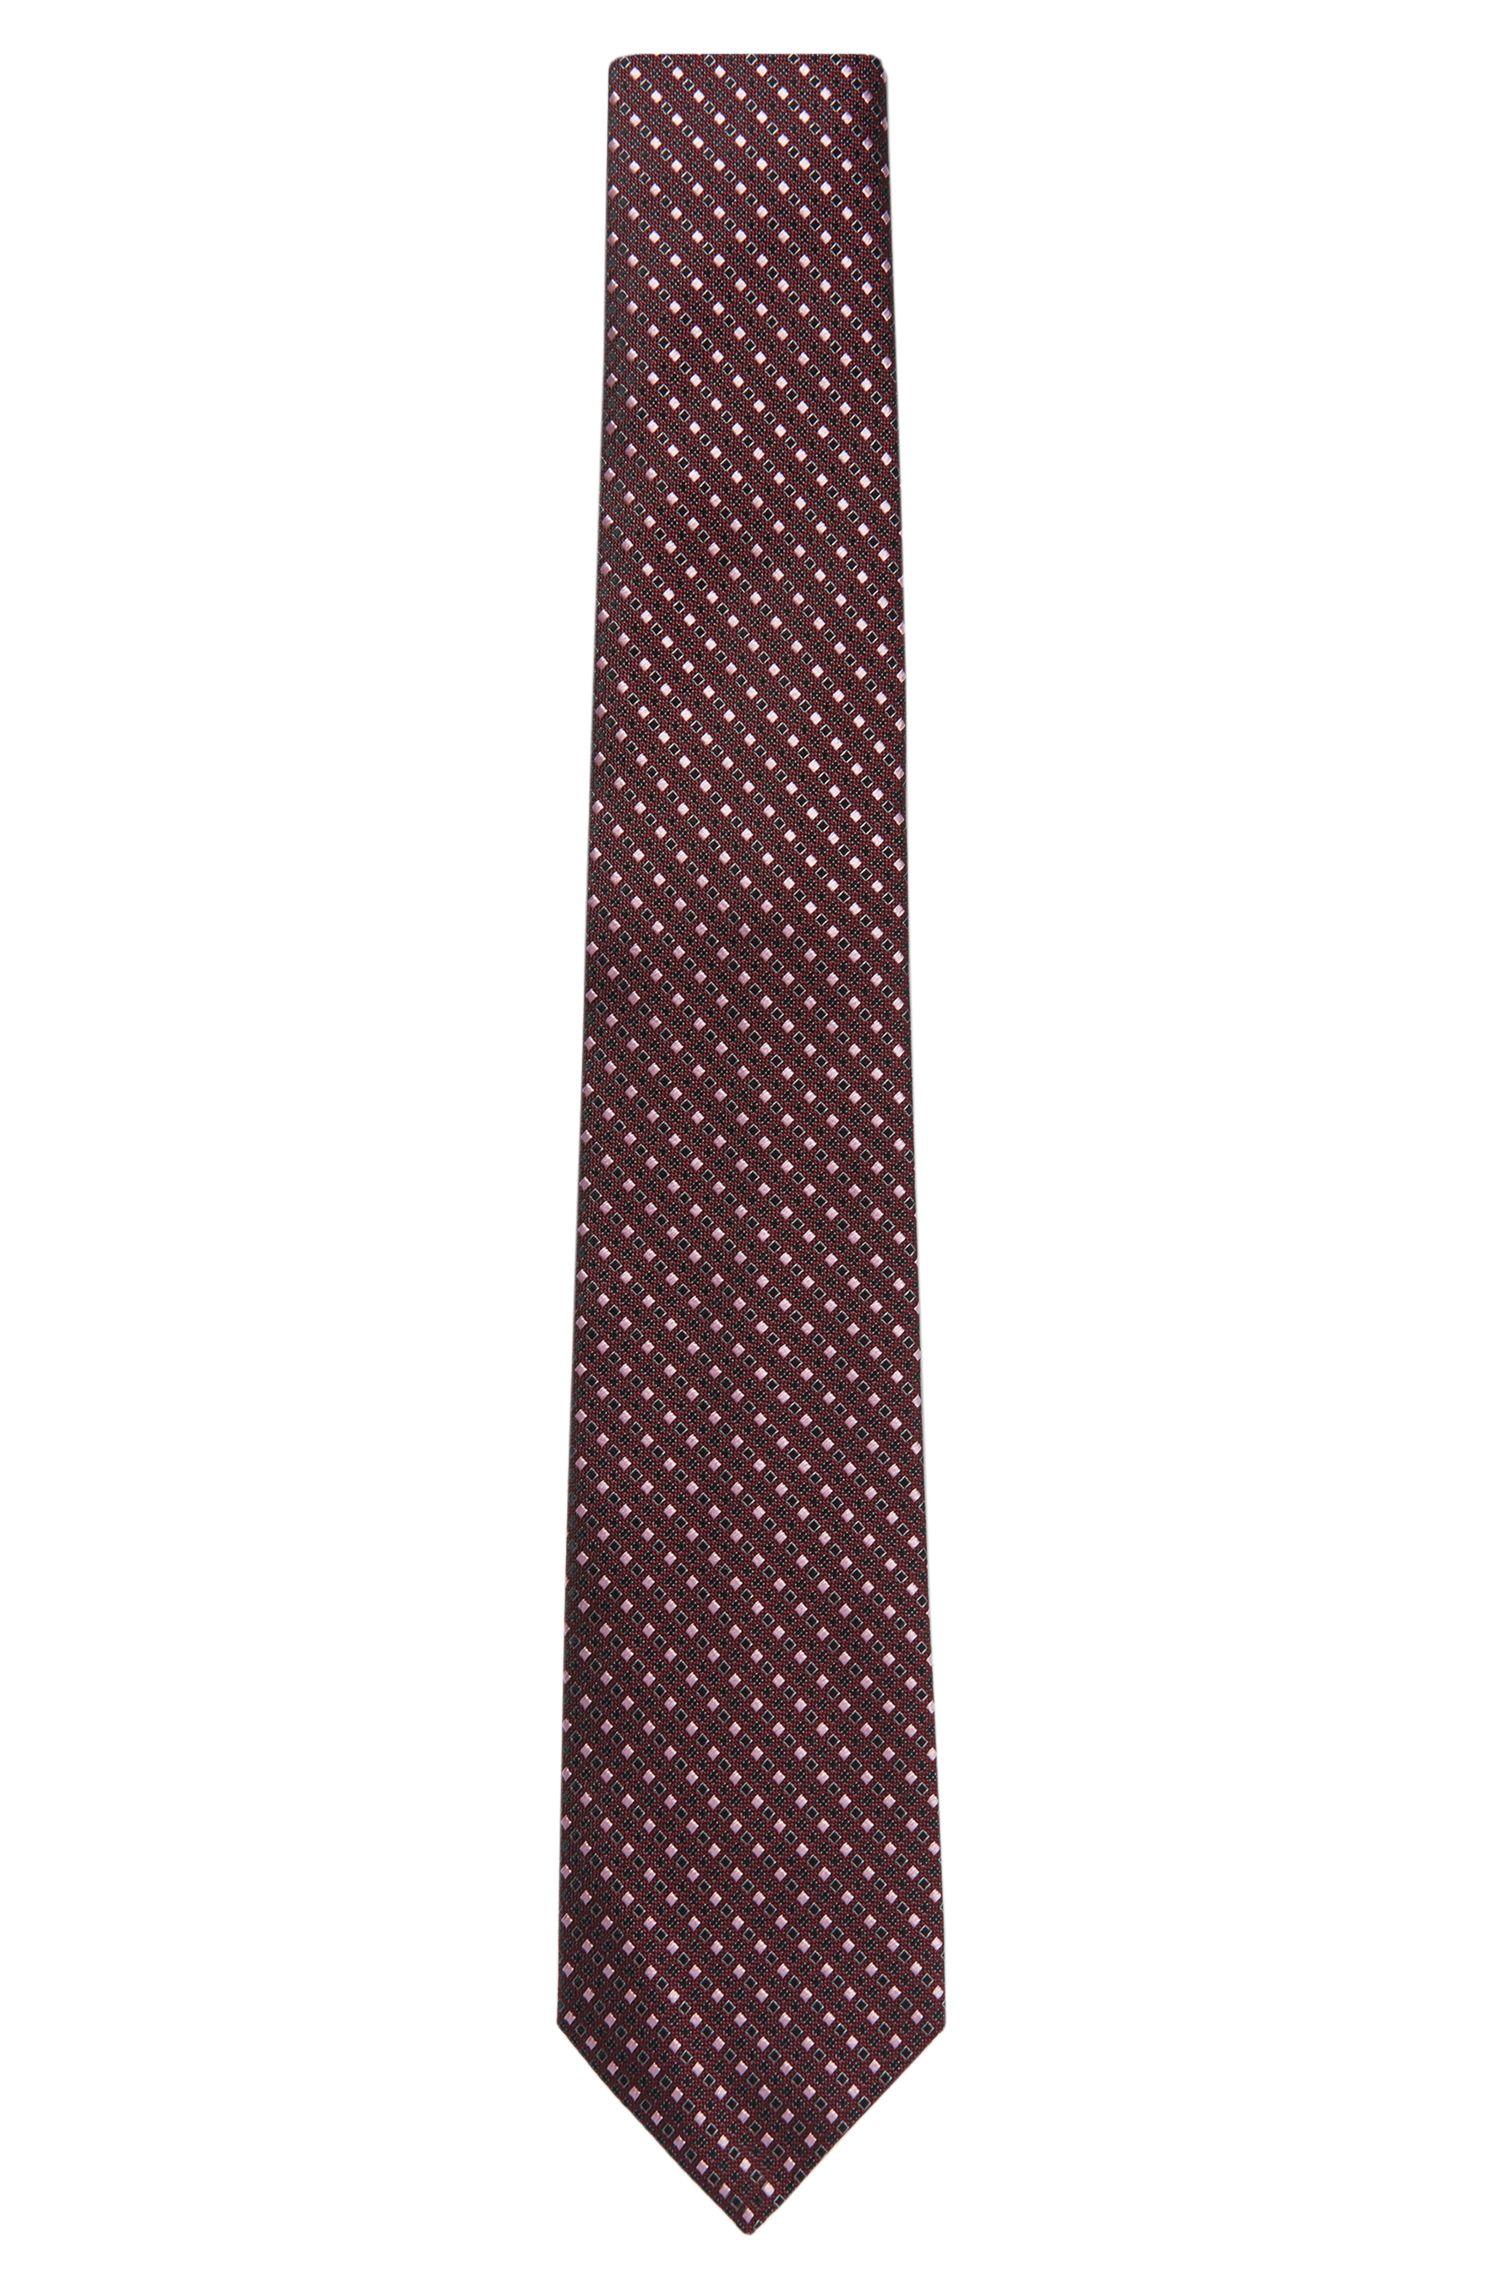 'T-Tie 7.5 cm' | Regular, Italian Silk Patterned Tie